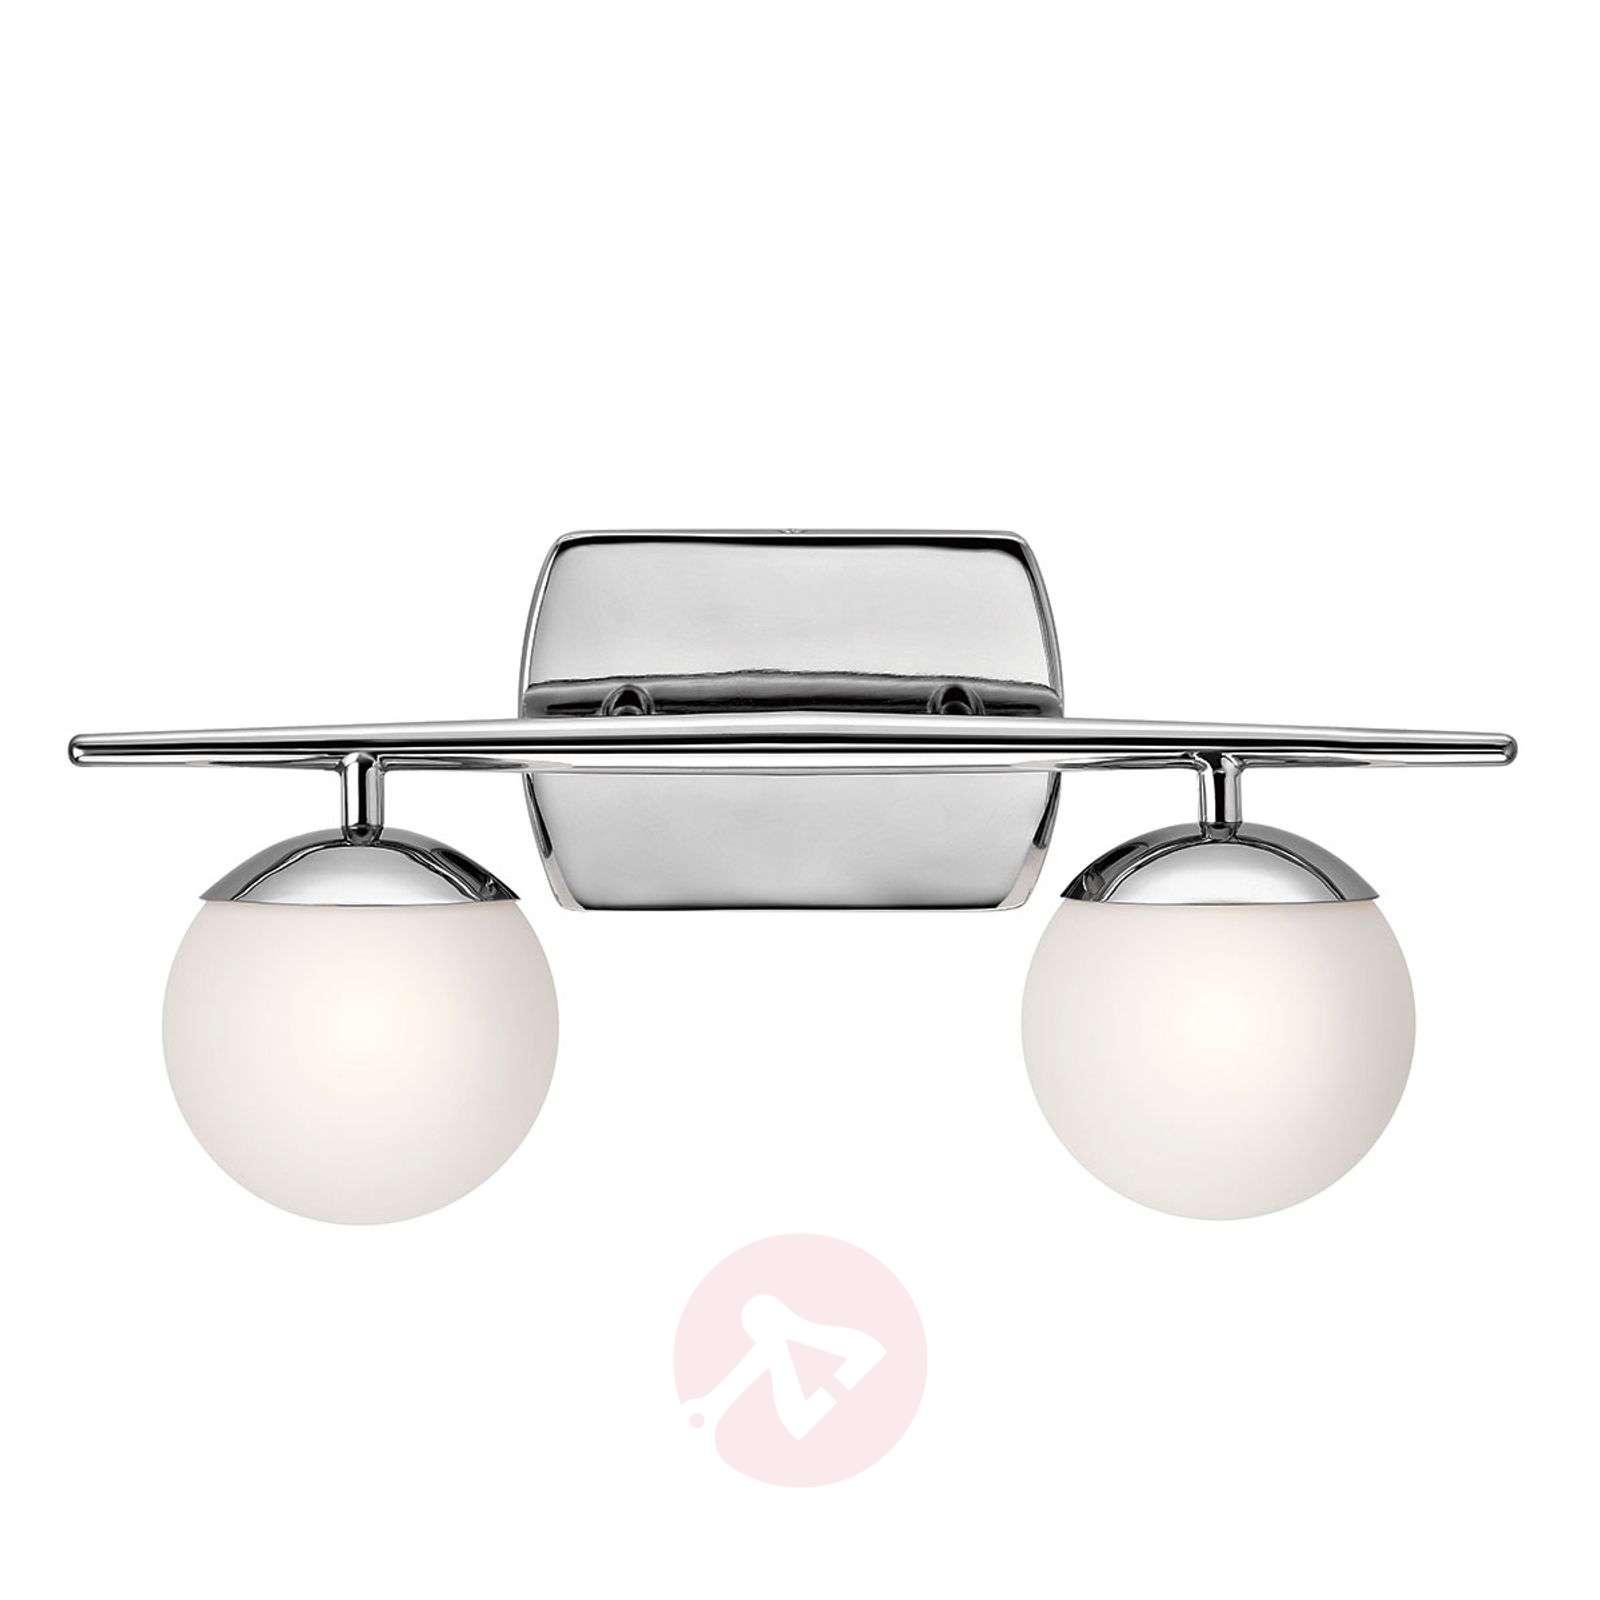 Two-bulb LED bathroom wall light Jasper, elegant-3048867-01